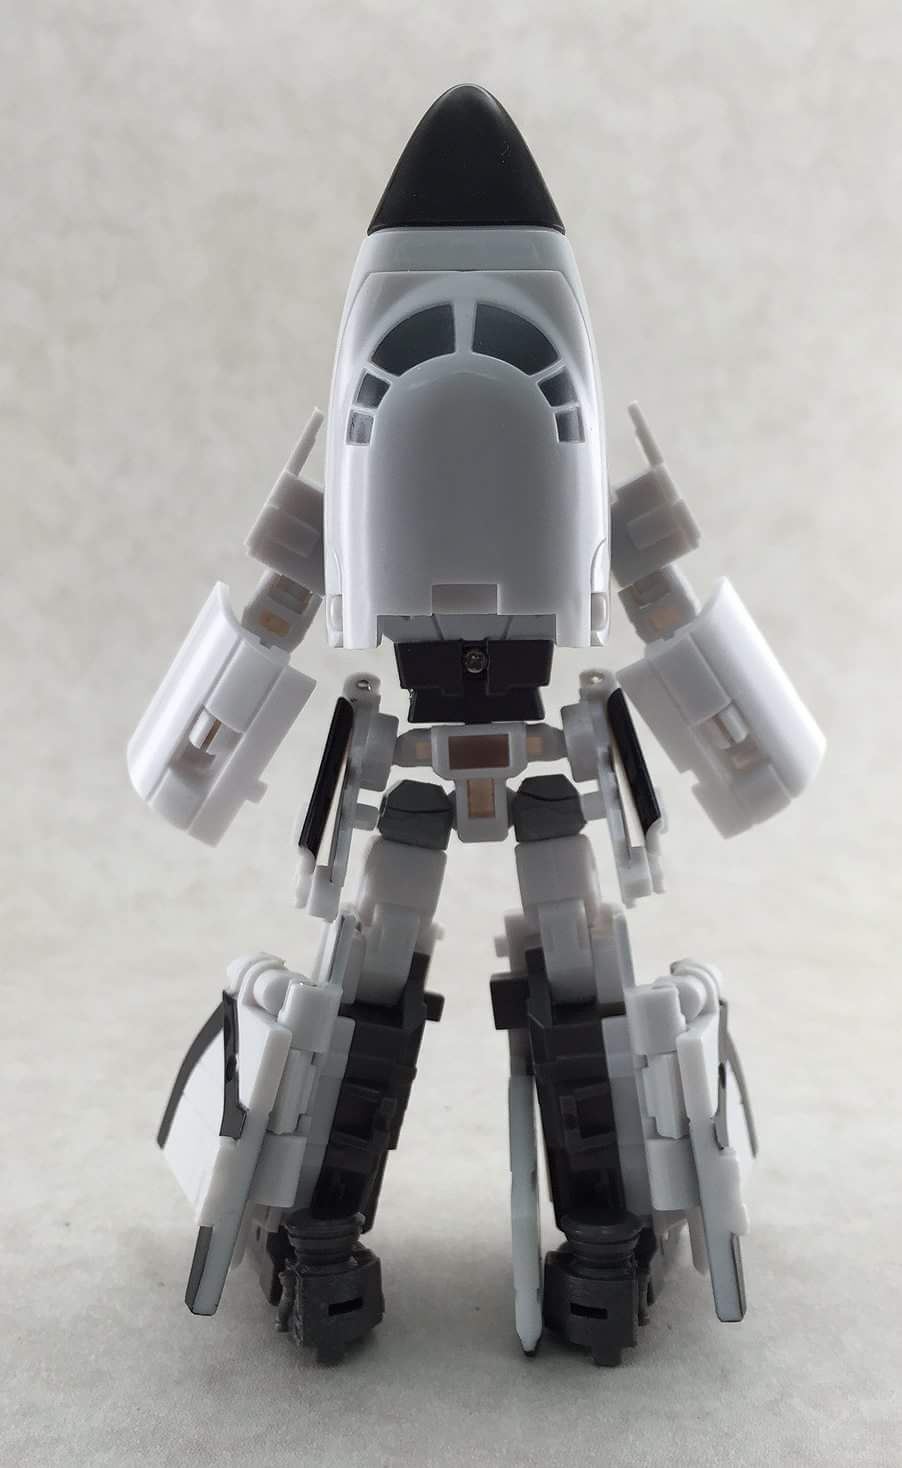 [Dessin Animé + Jouets] Gobots — Machine Robo - Page 5 SBCbVou2